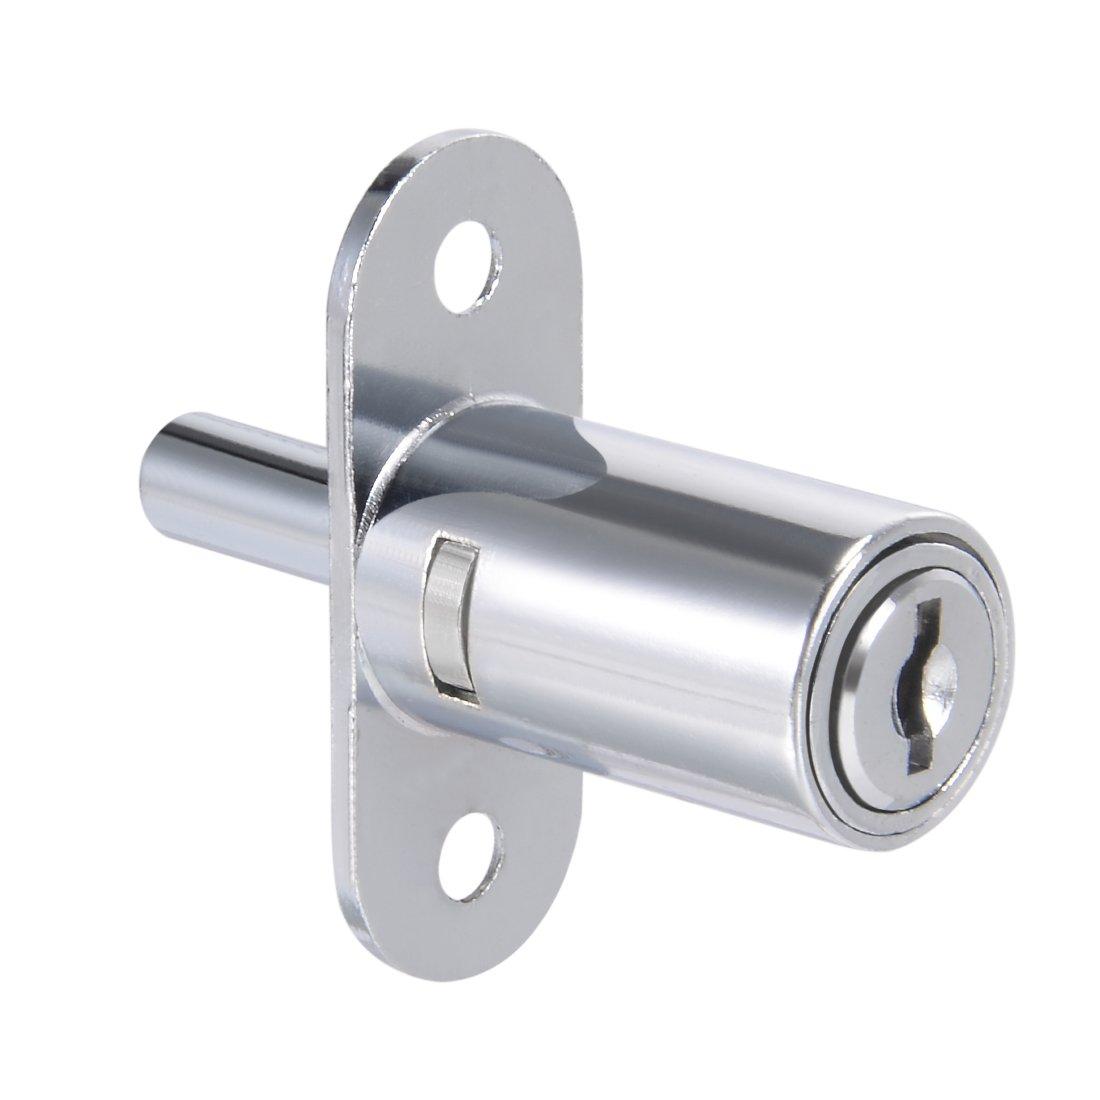 uxcell 3/4-inch(19mm) Cylinder Push Plunger Lock Zinc Alloy Chrome Finish, Keyed Alike a18030700ux0038